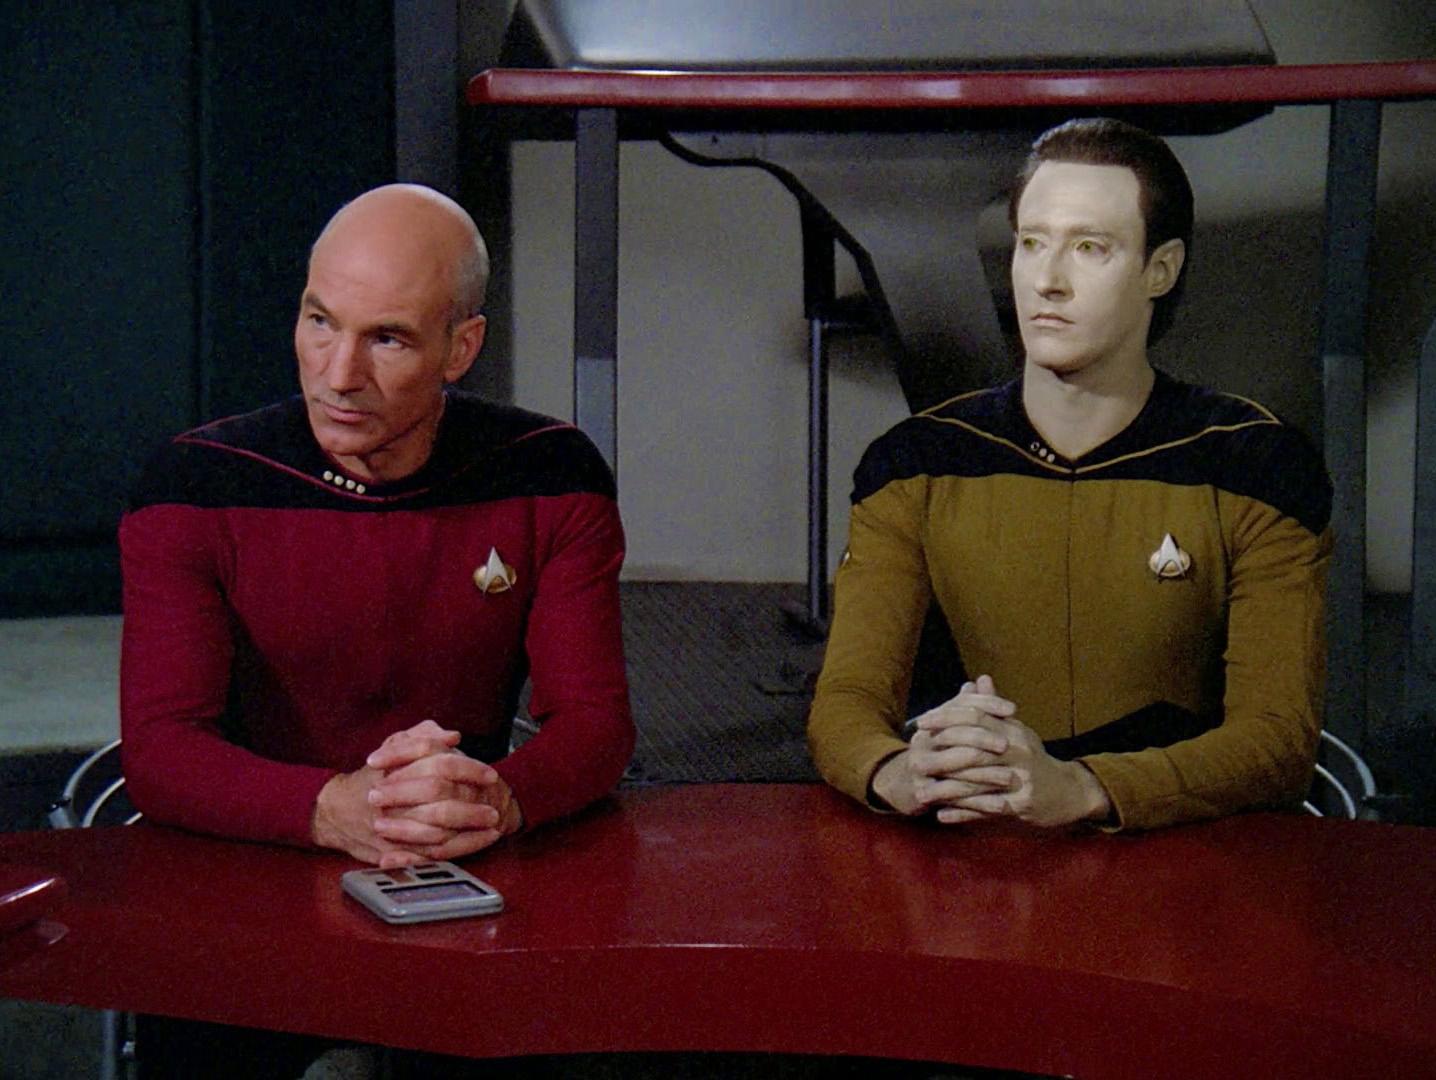 The Measure of a Man (Star Trek: The Next Generation, Season 2, Episode 9)